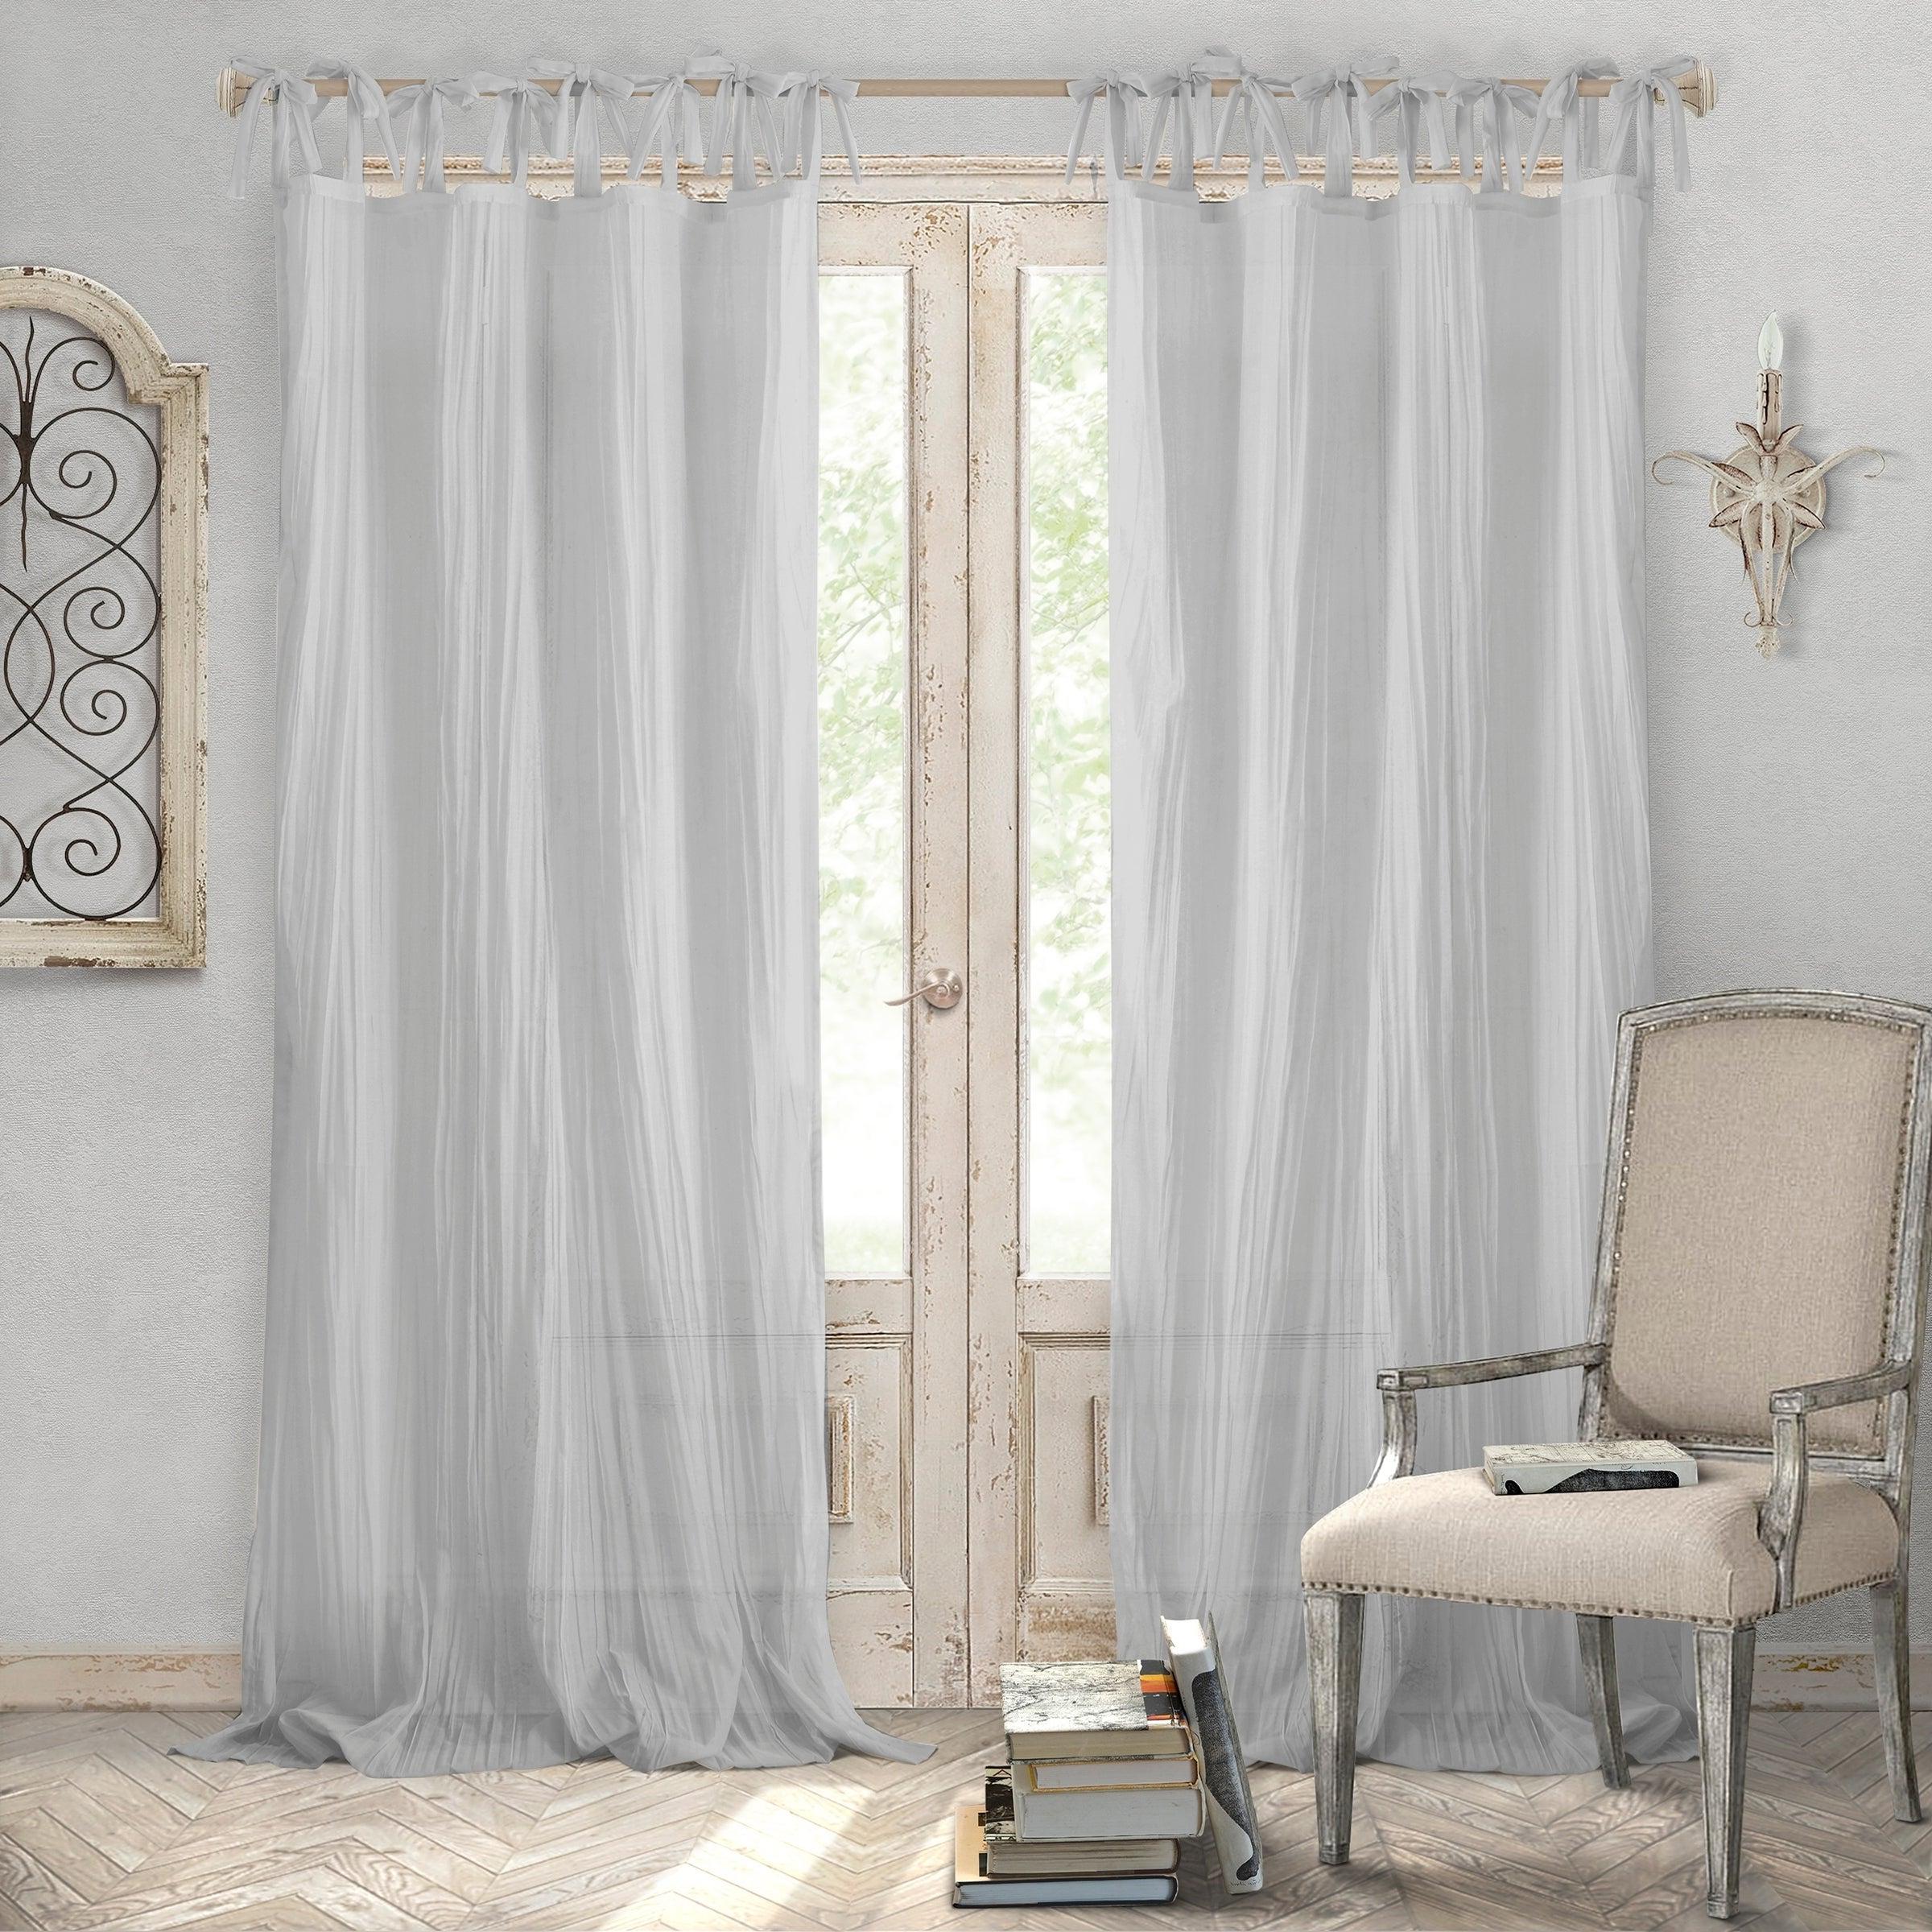 Elrene Jolie Tie Top Curtain Panel Inside Most Recent Elrene Jolie Tie Top Curtain Panels (Gallery 2 of 20)